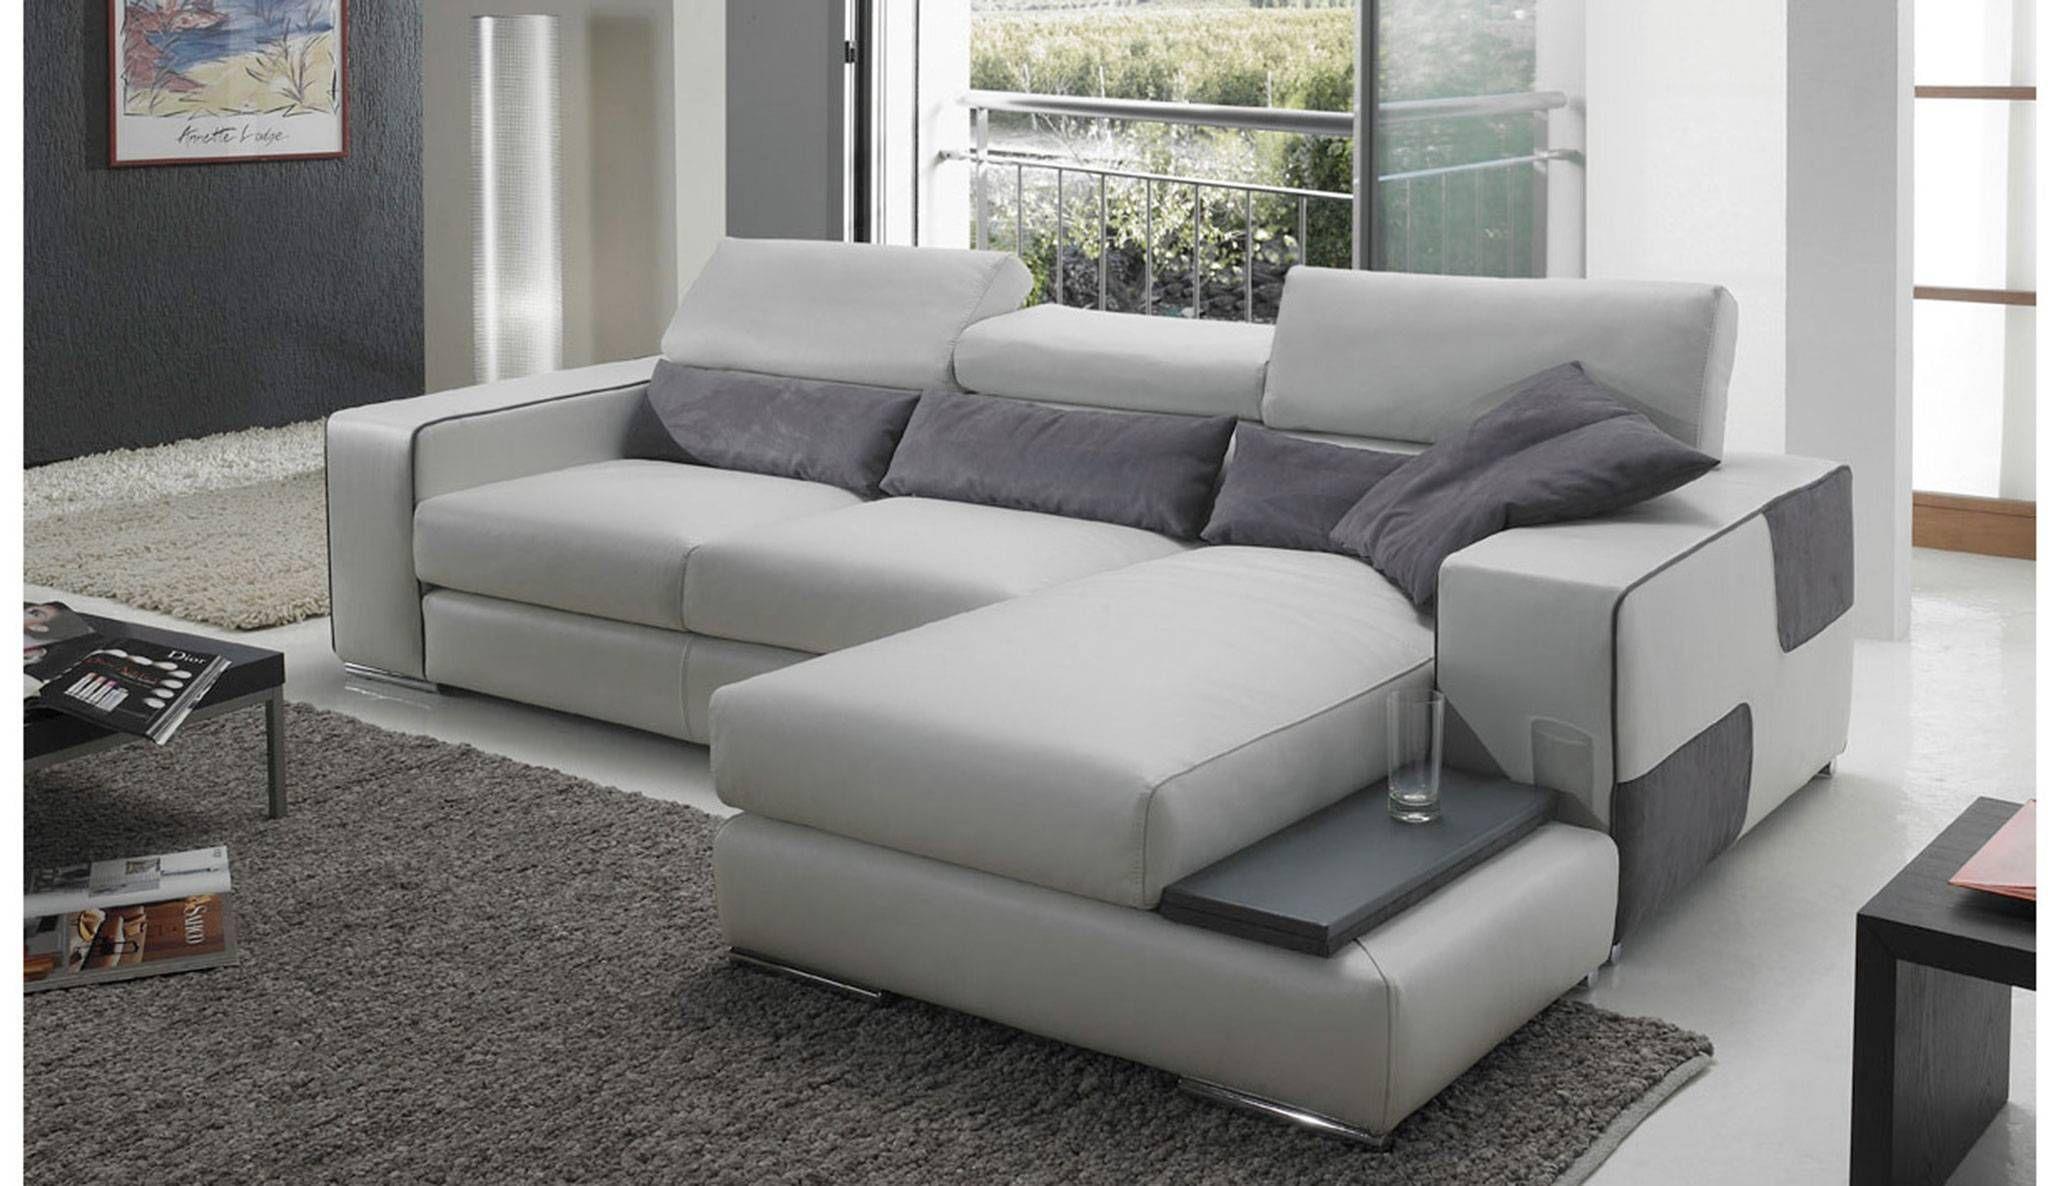 Canape Cuir Pas Cher Canape Design Pas Cher Tissu In 2020 Home